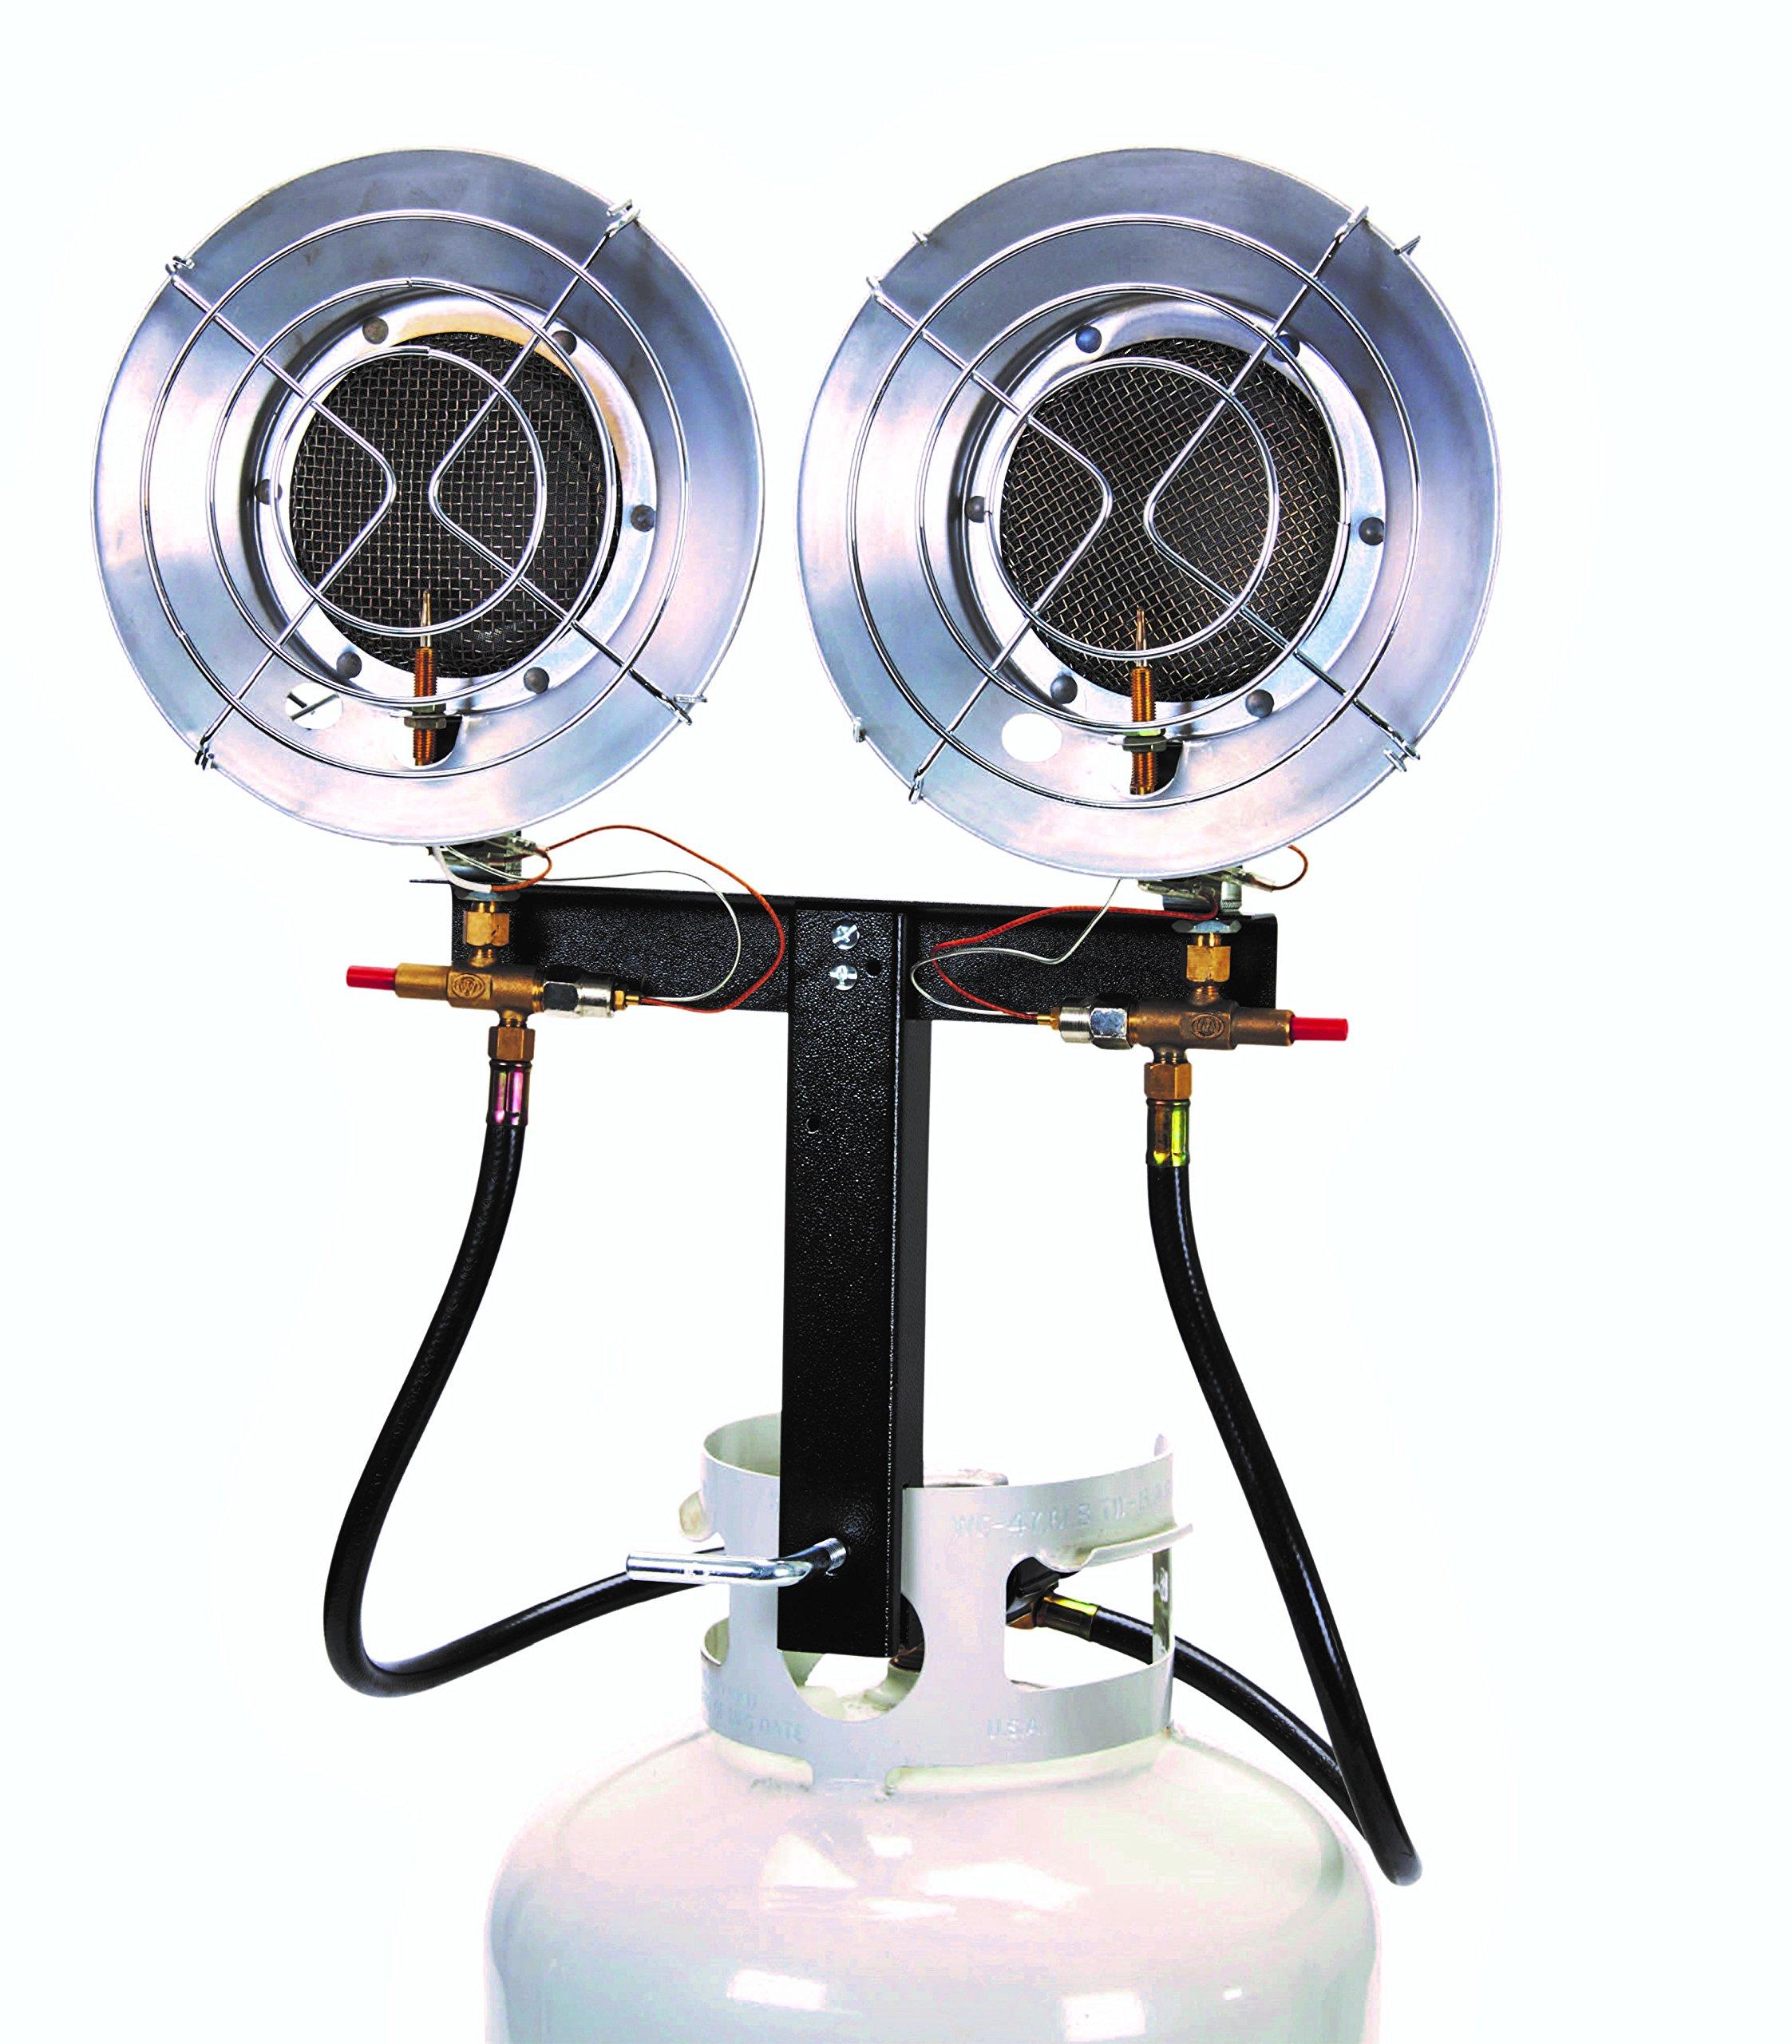 AZ Patio LP-5000-BD Double Tank Top Heater